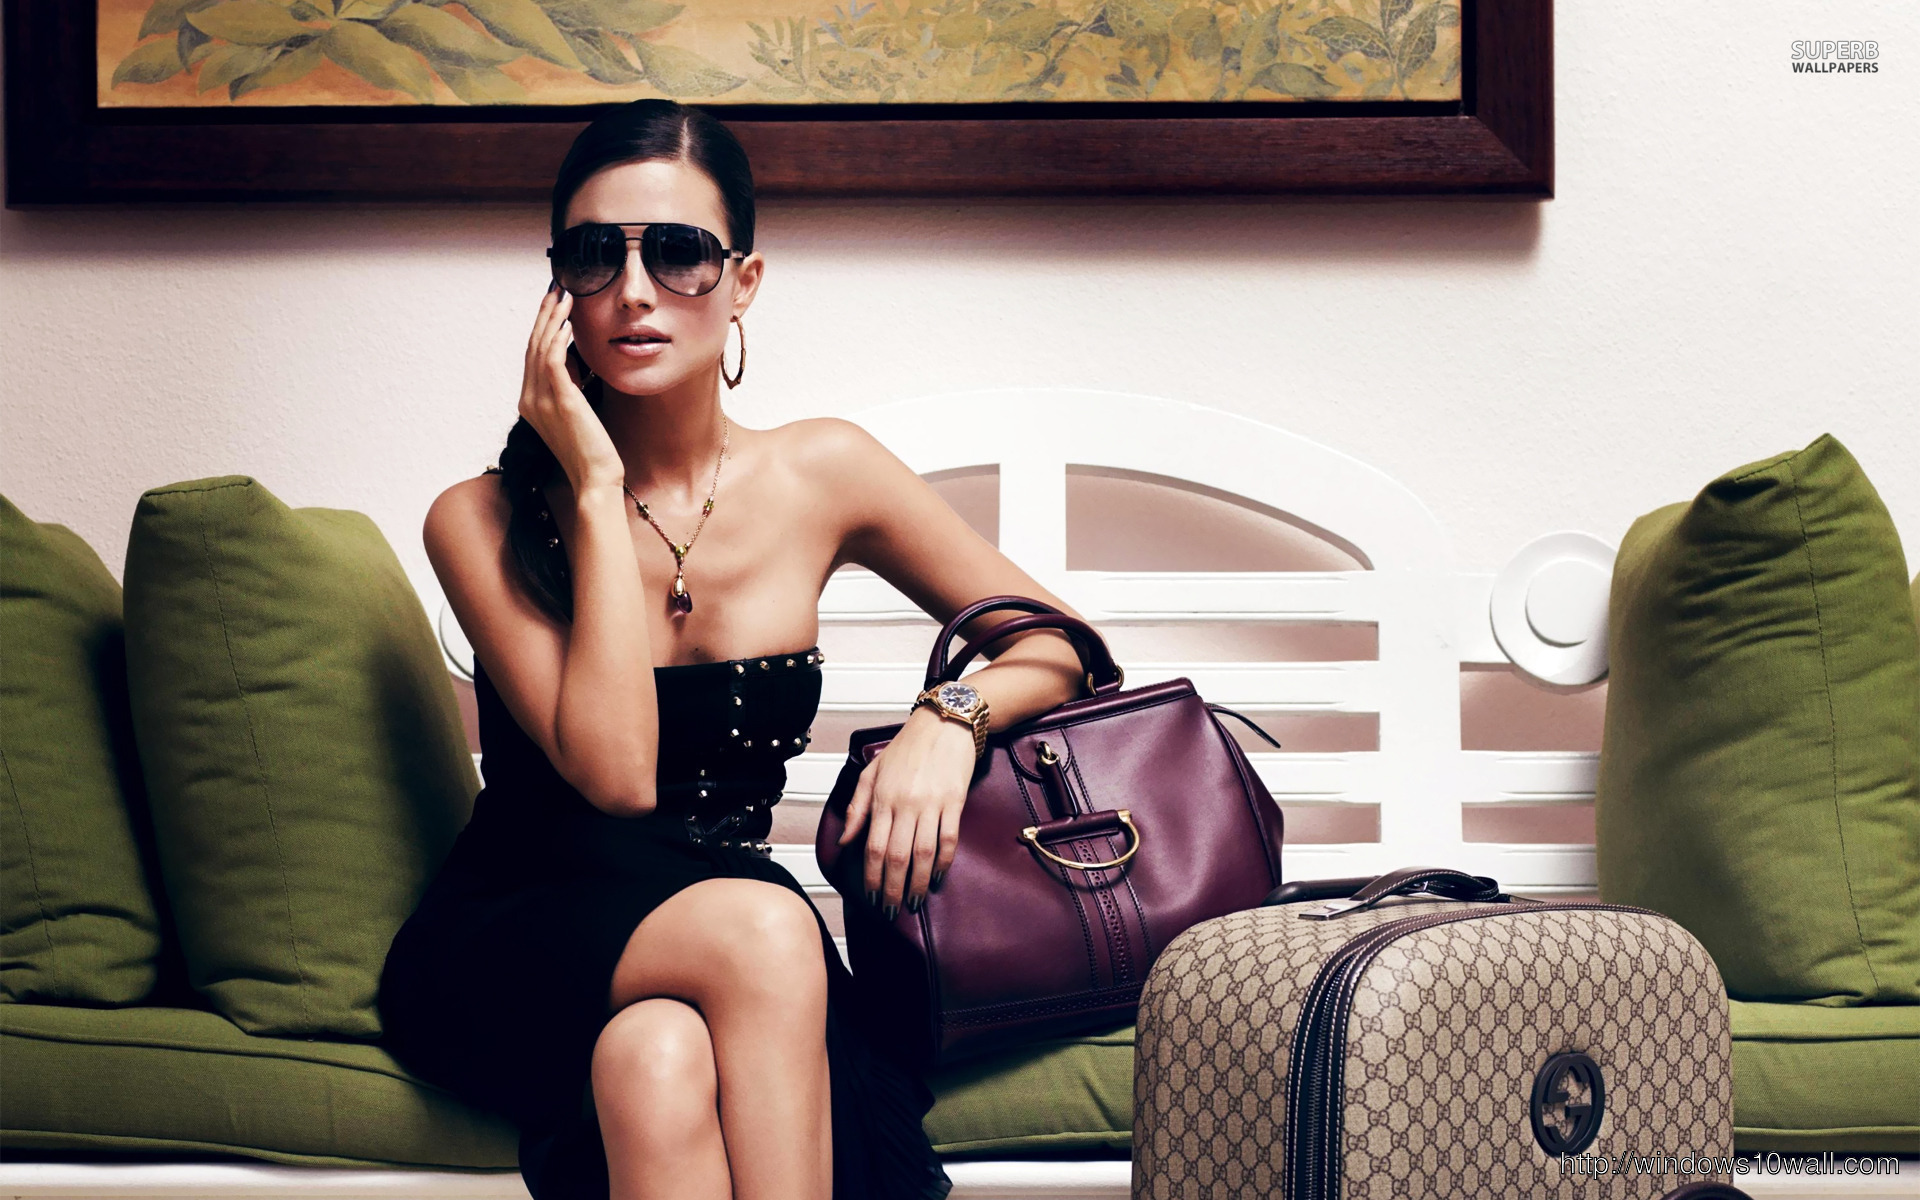 Diana Morales in Sunglasses 1920x1200 wallpaper